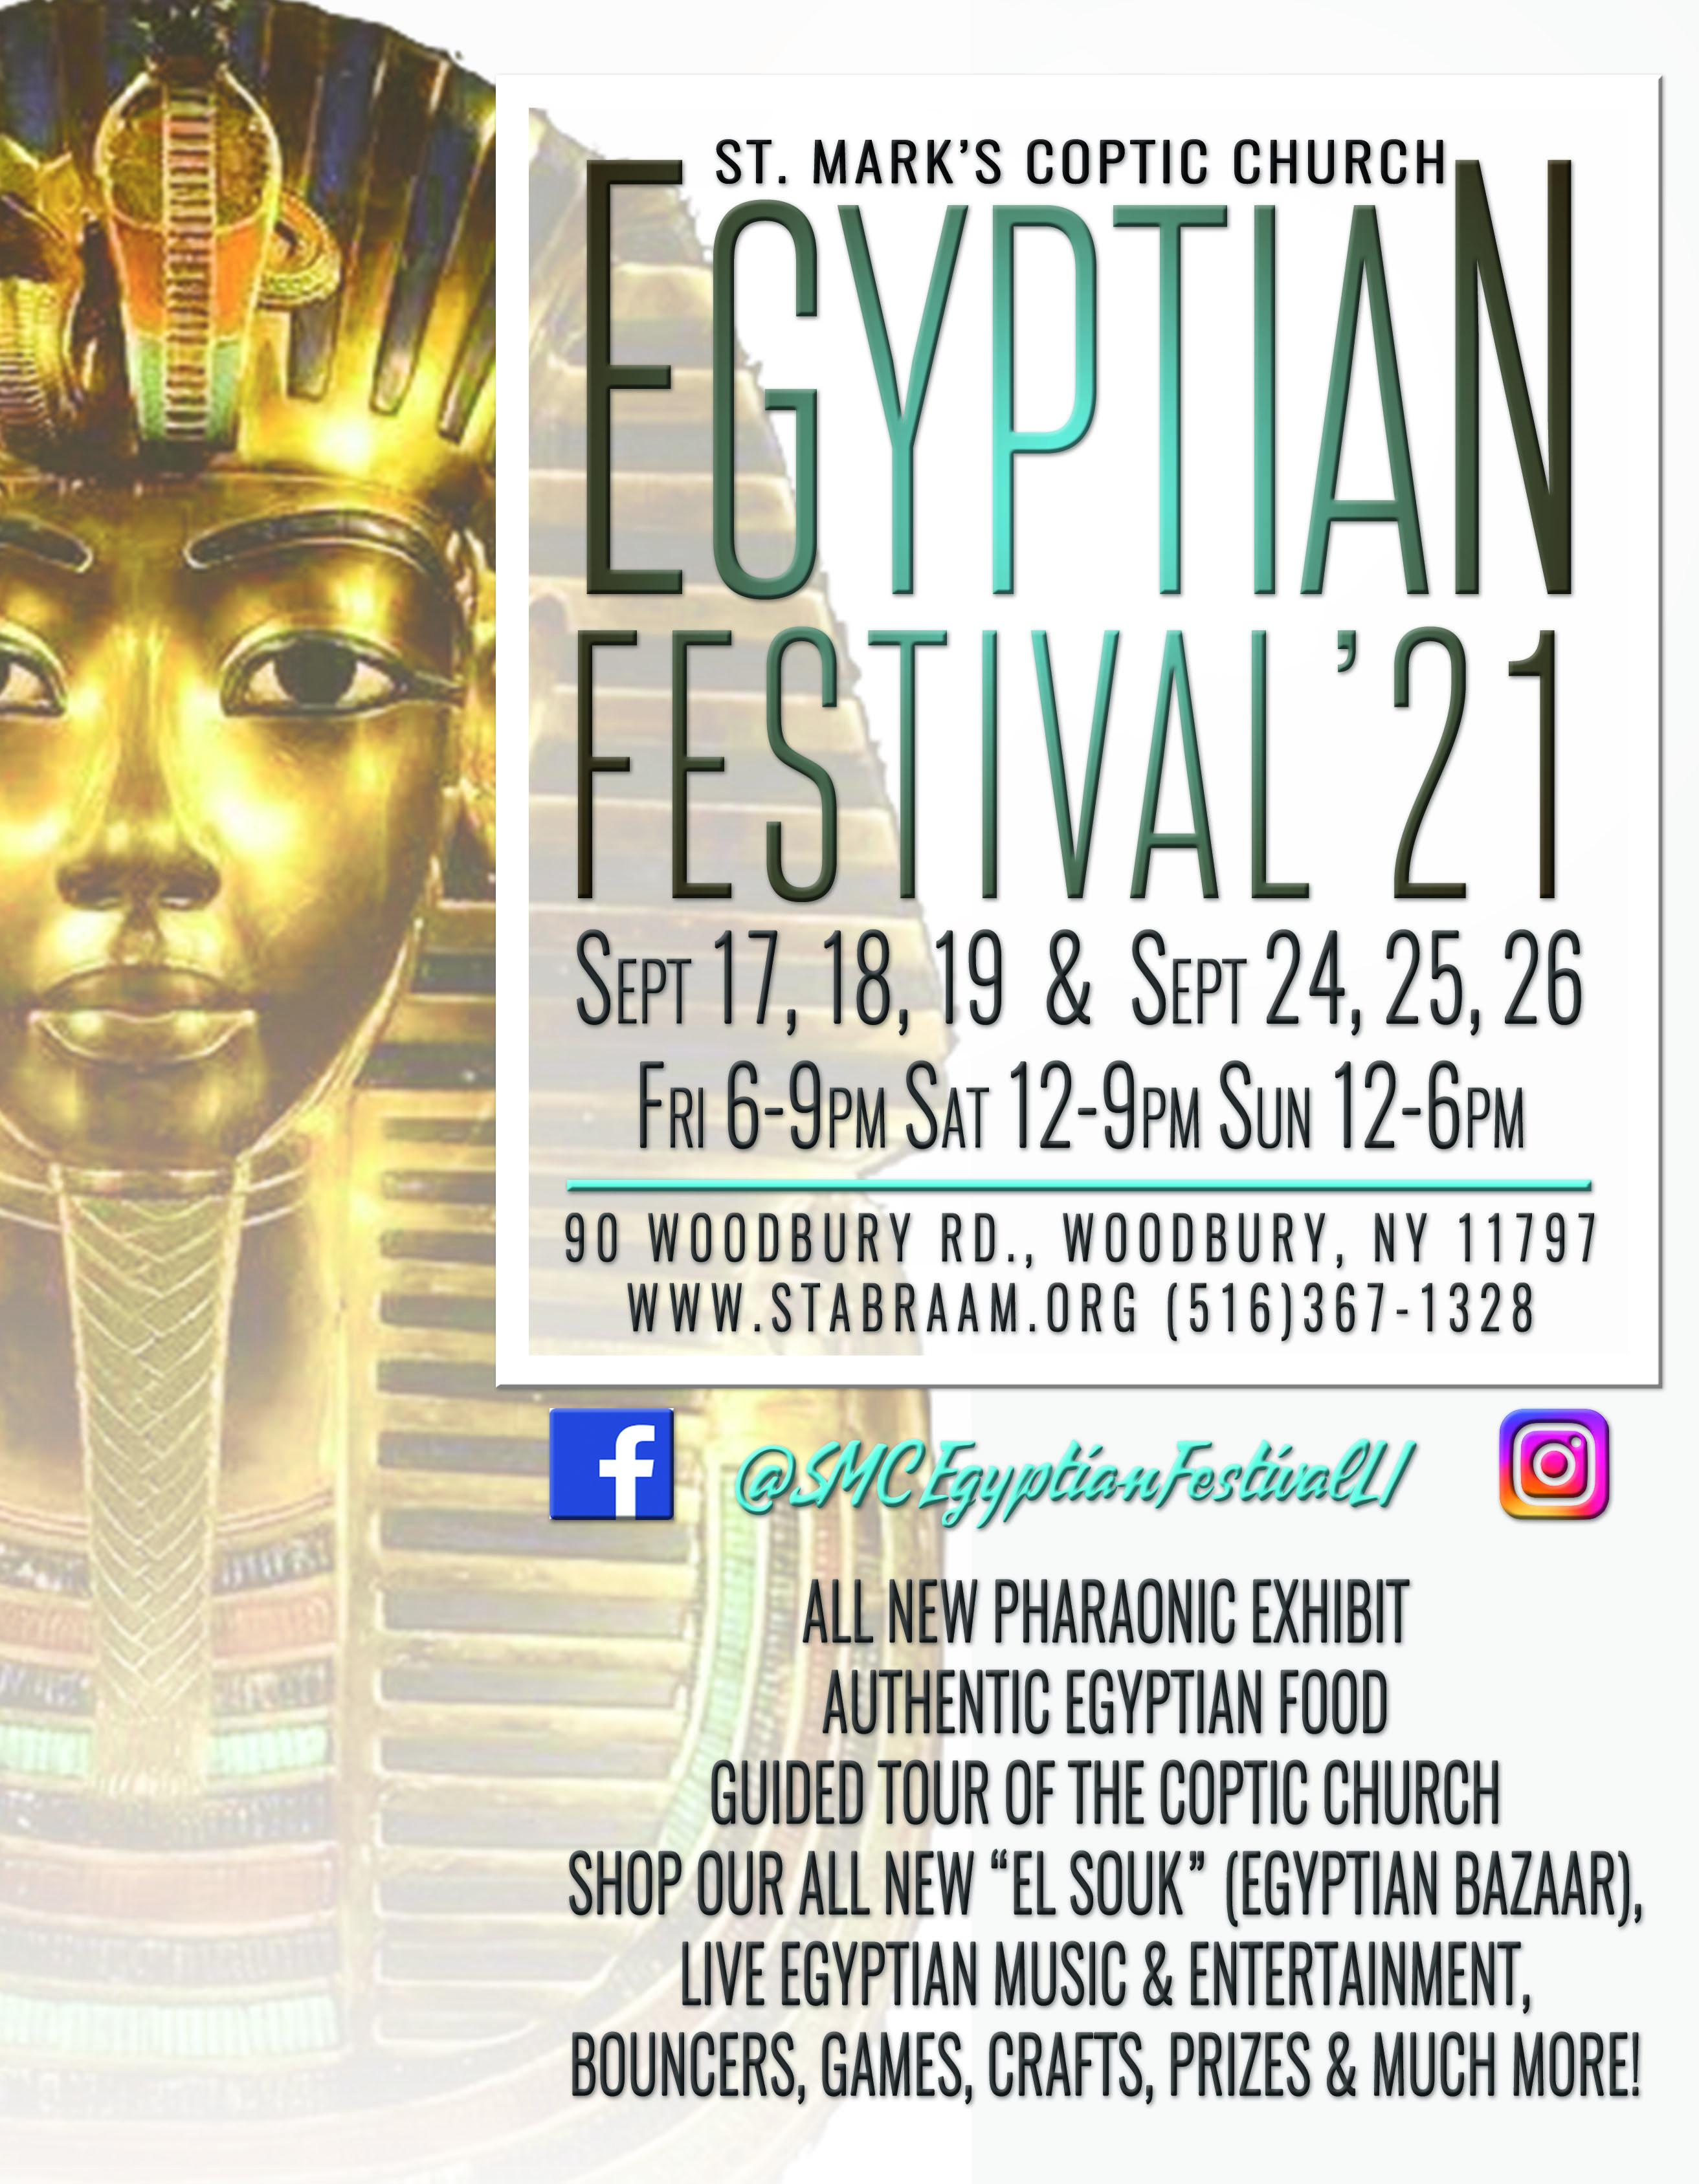 St. Marks Egyptian Festival at St. Marks Coptic Church